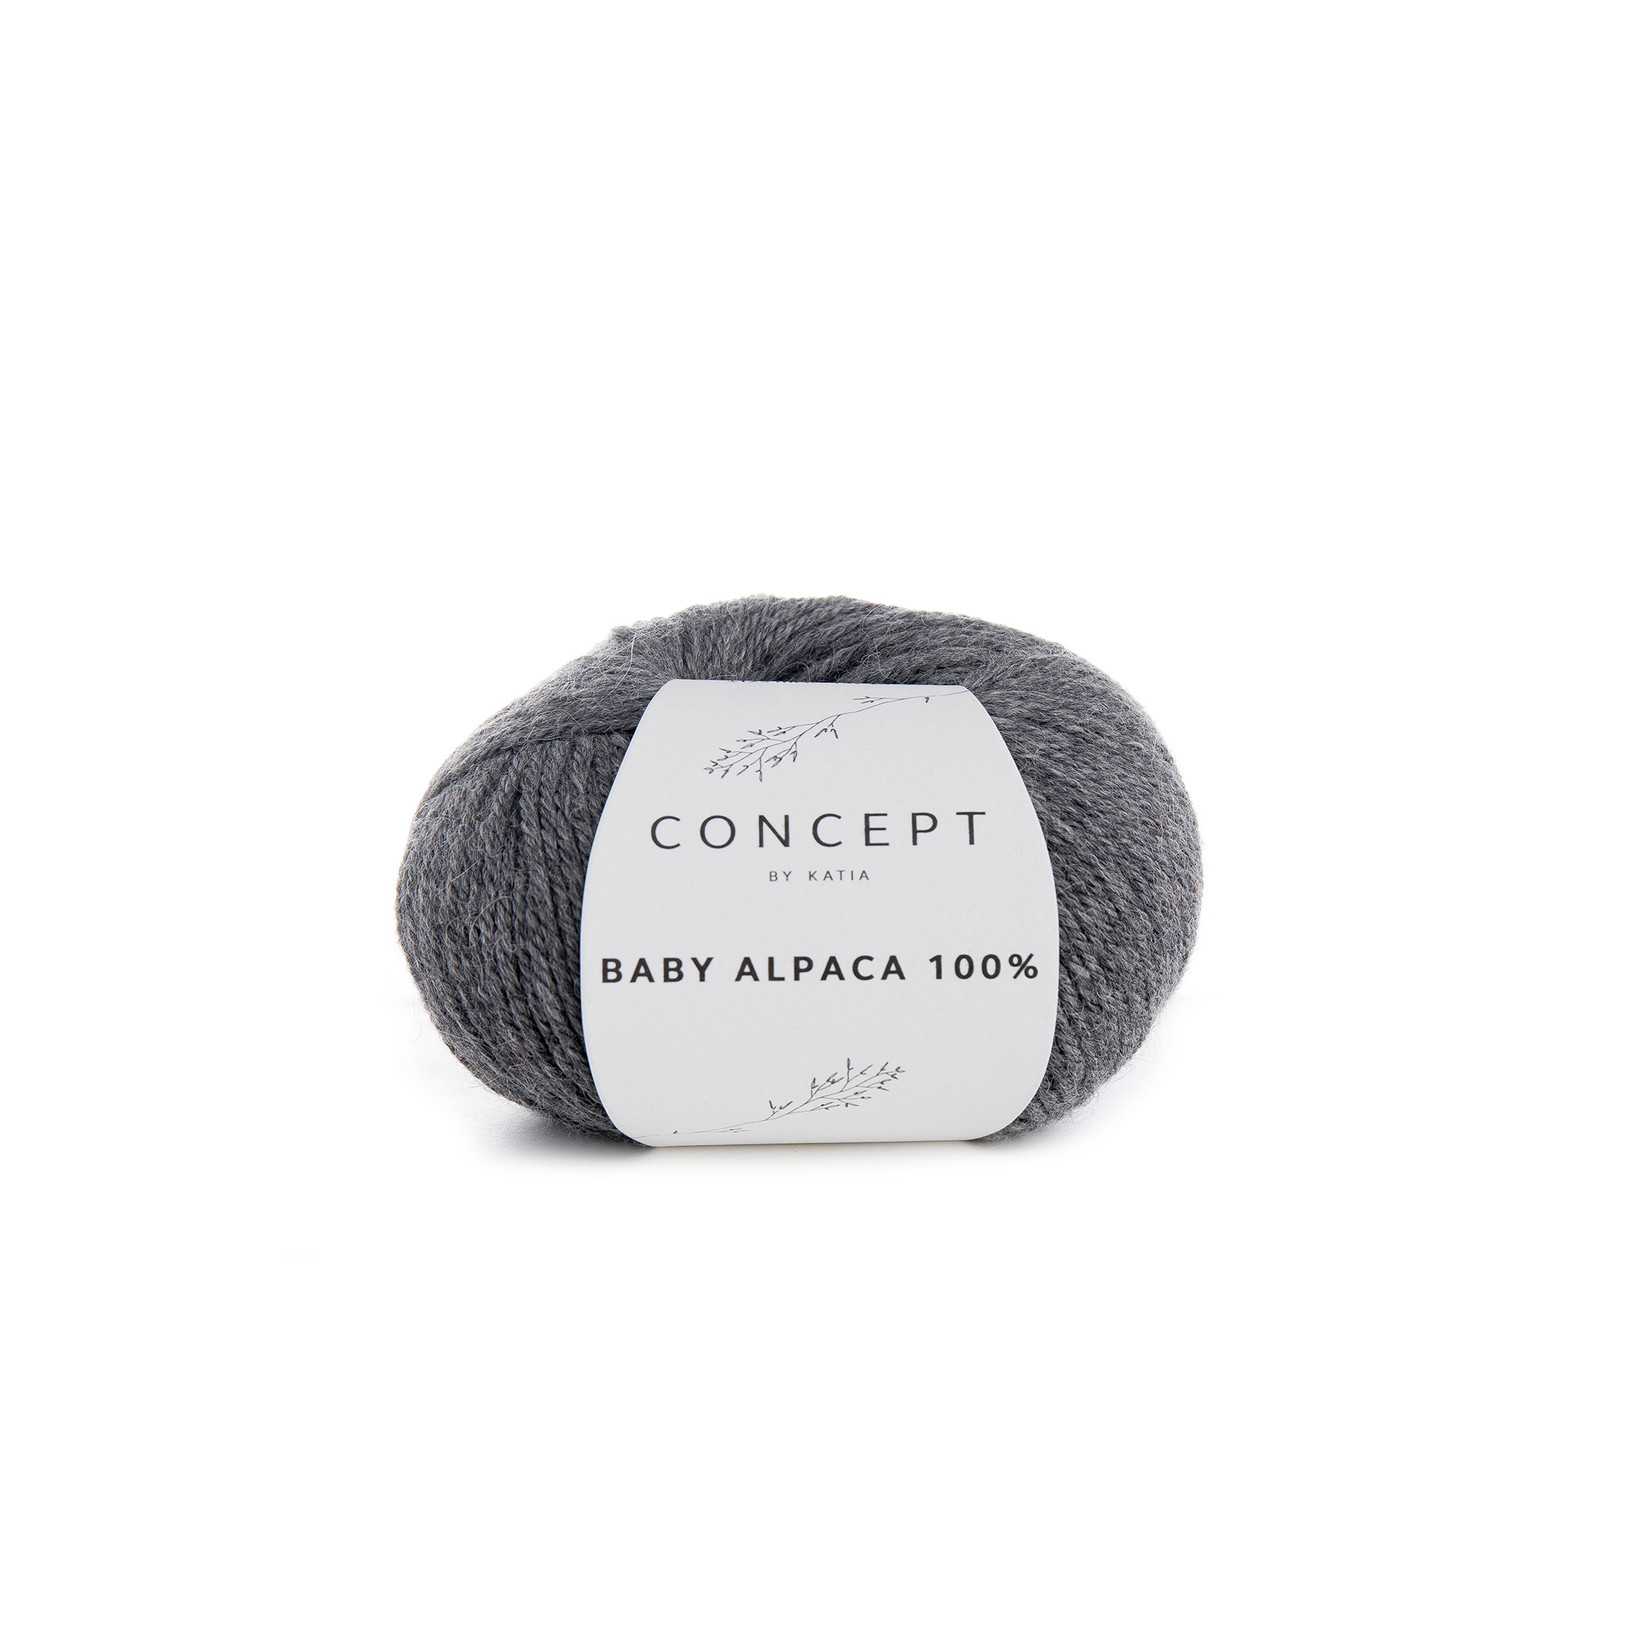 Katia Baby Alpaca 100% - kleur 504 - Medium grijs - 50 gr. = 125 m. - 100% Baby Alpaca